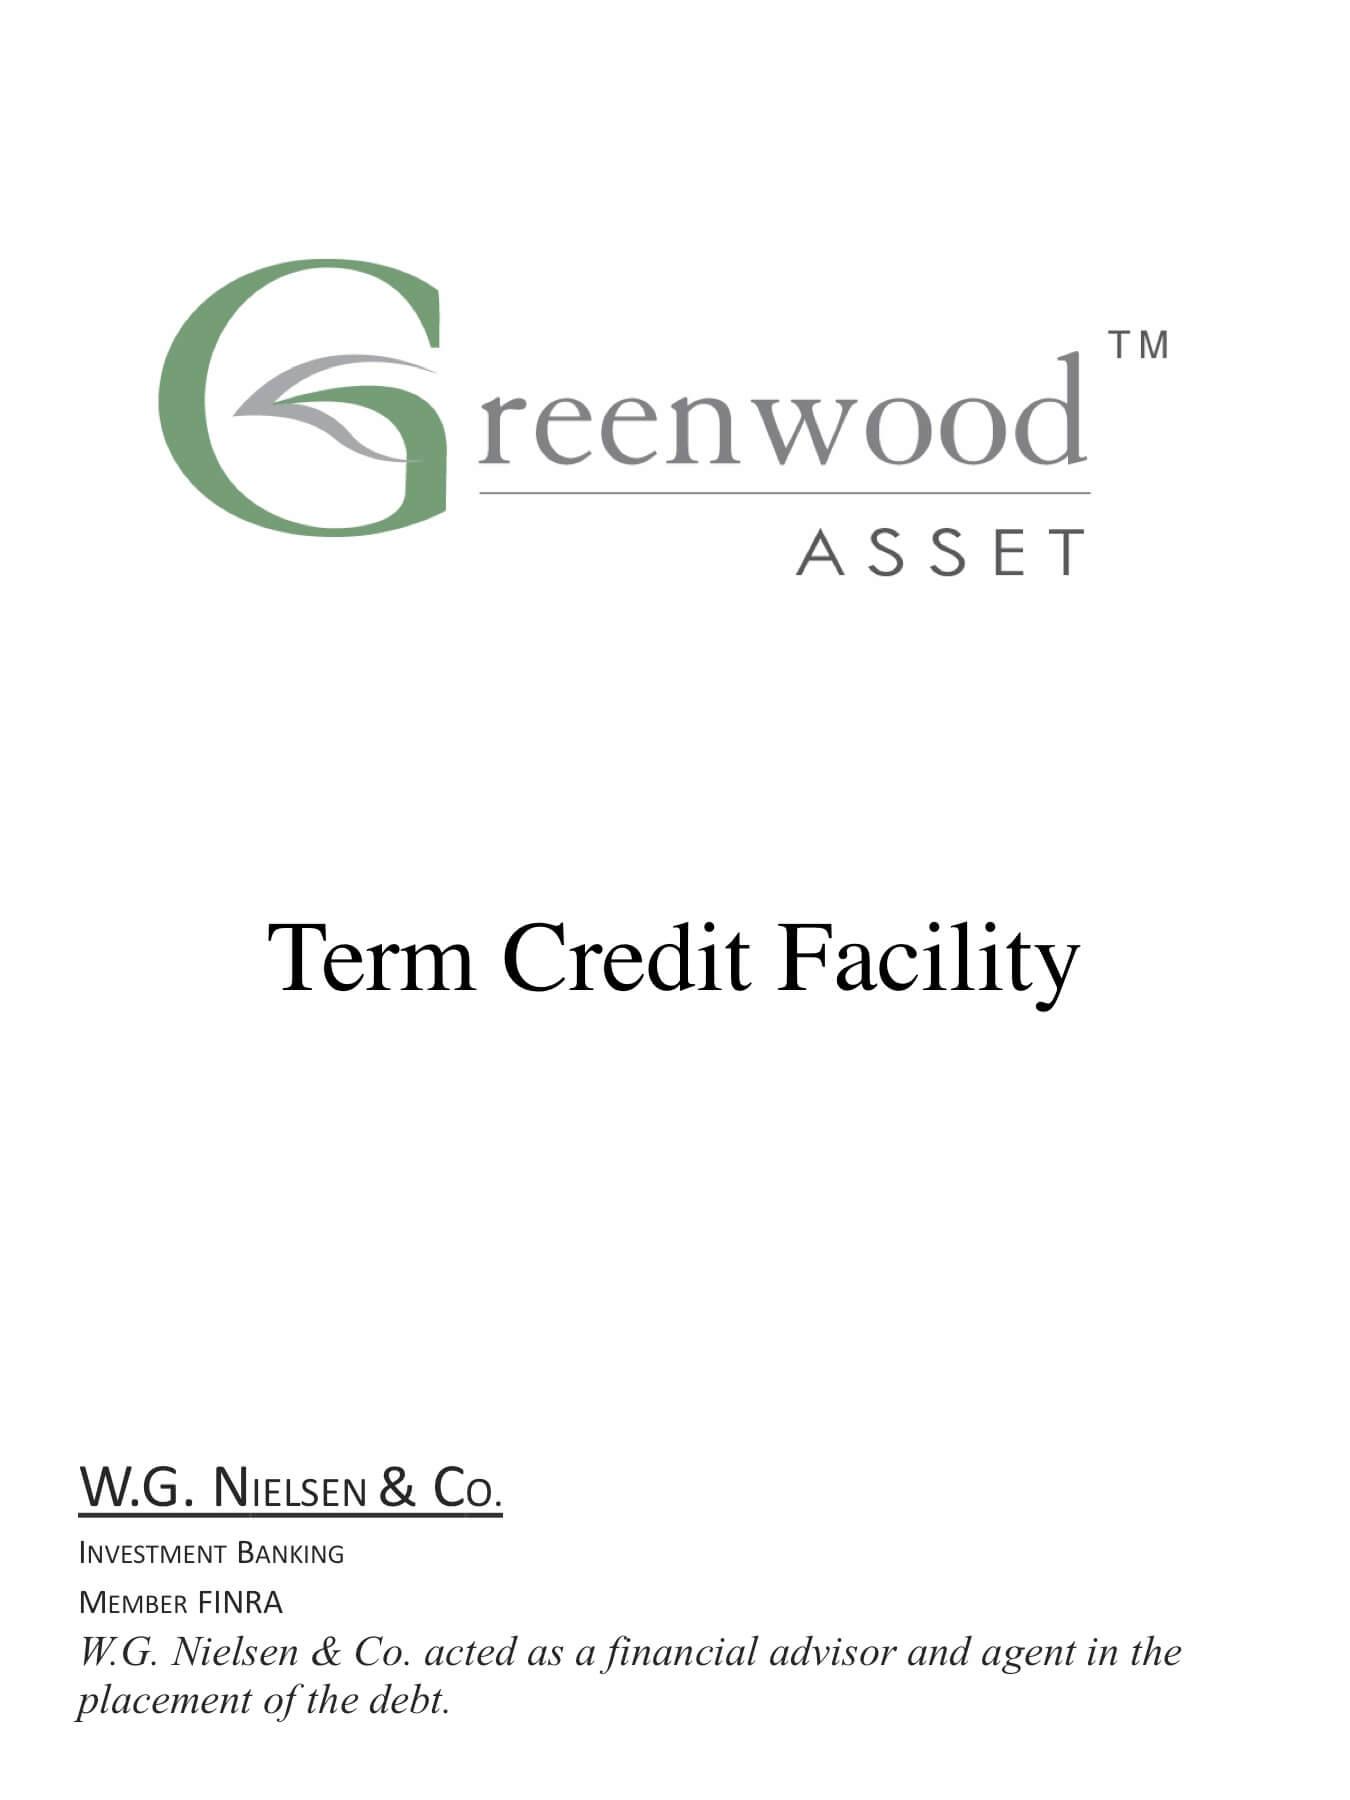 greenwood asset investment banking transaction